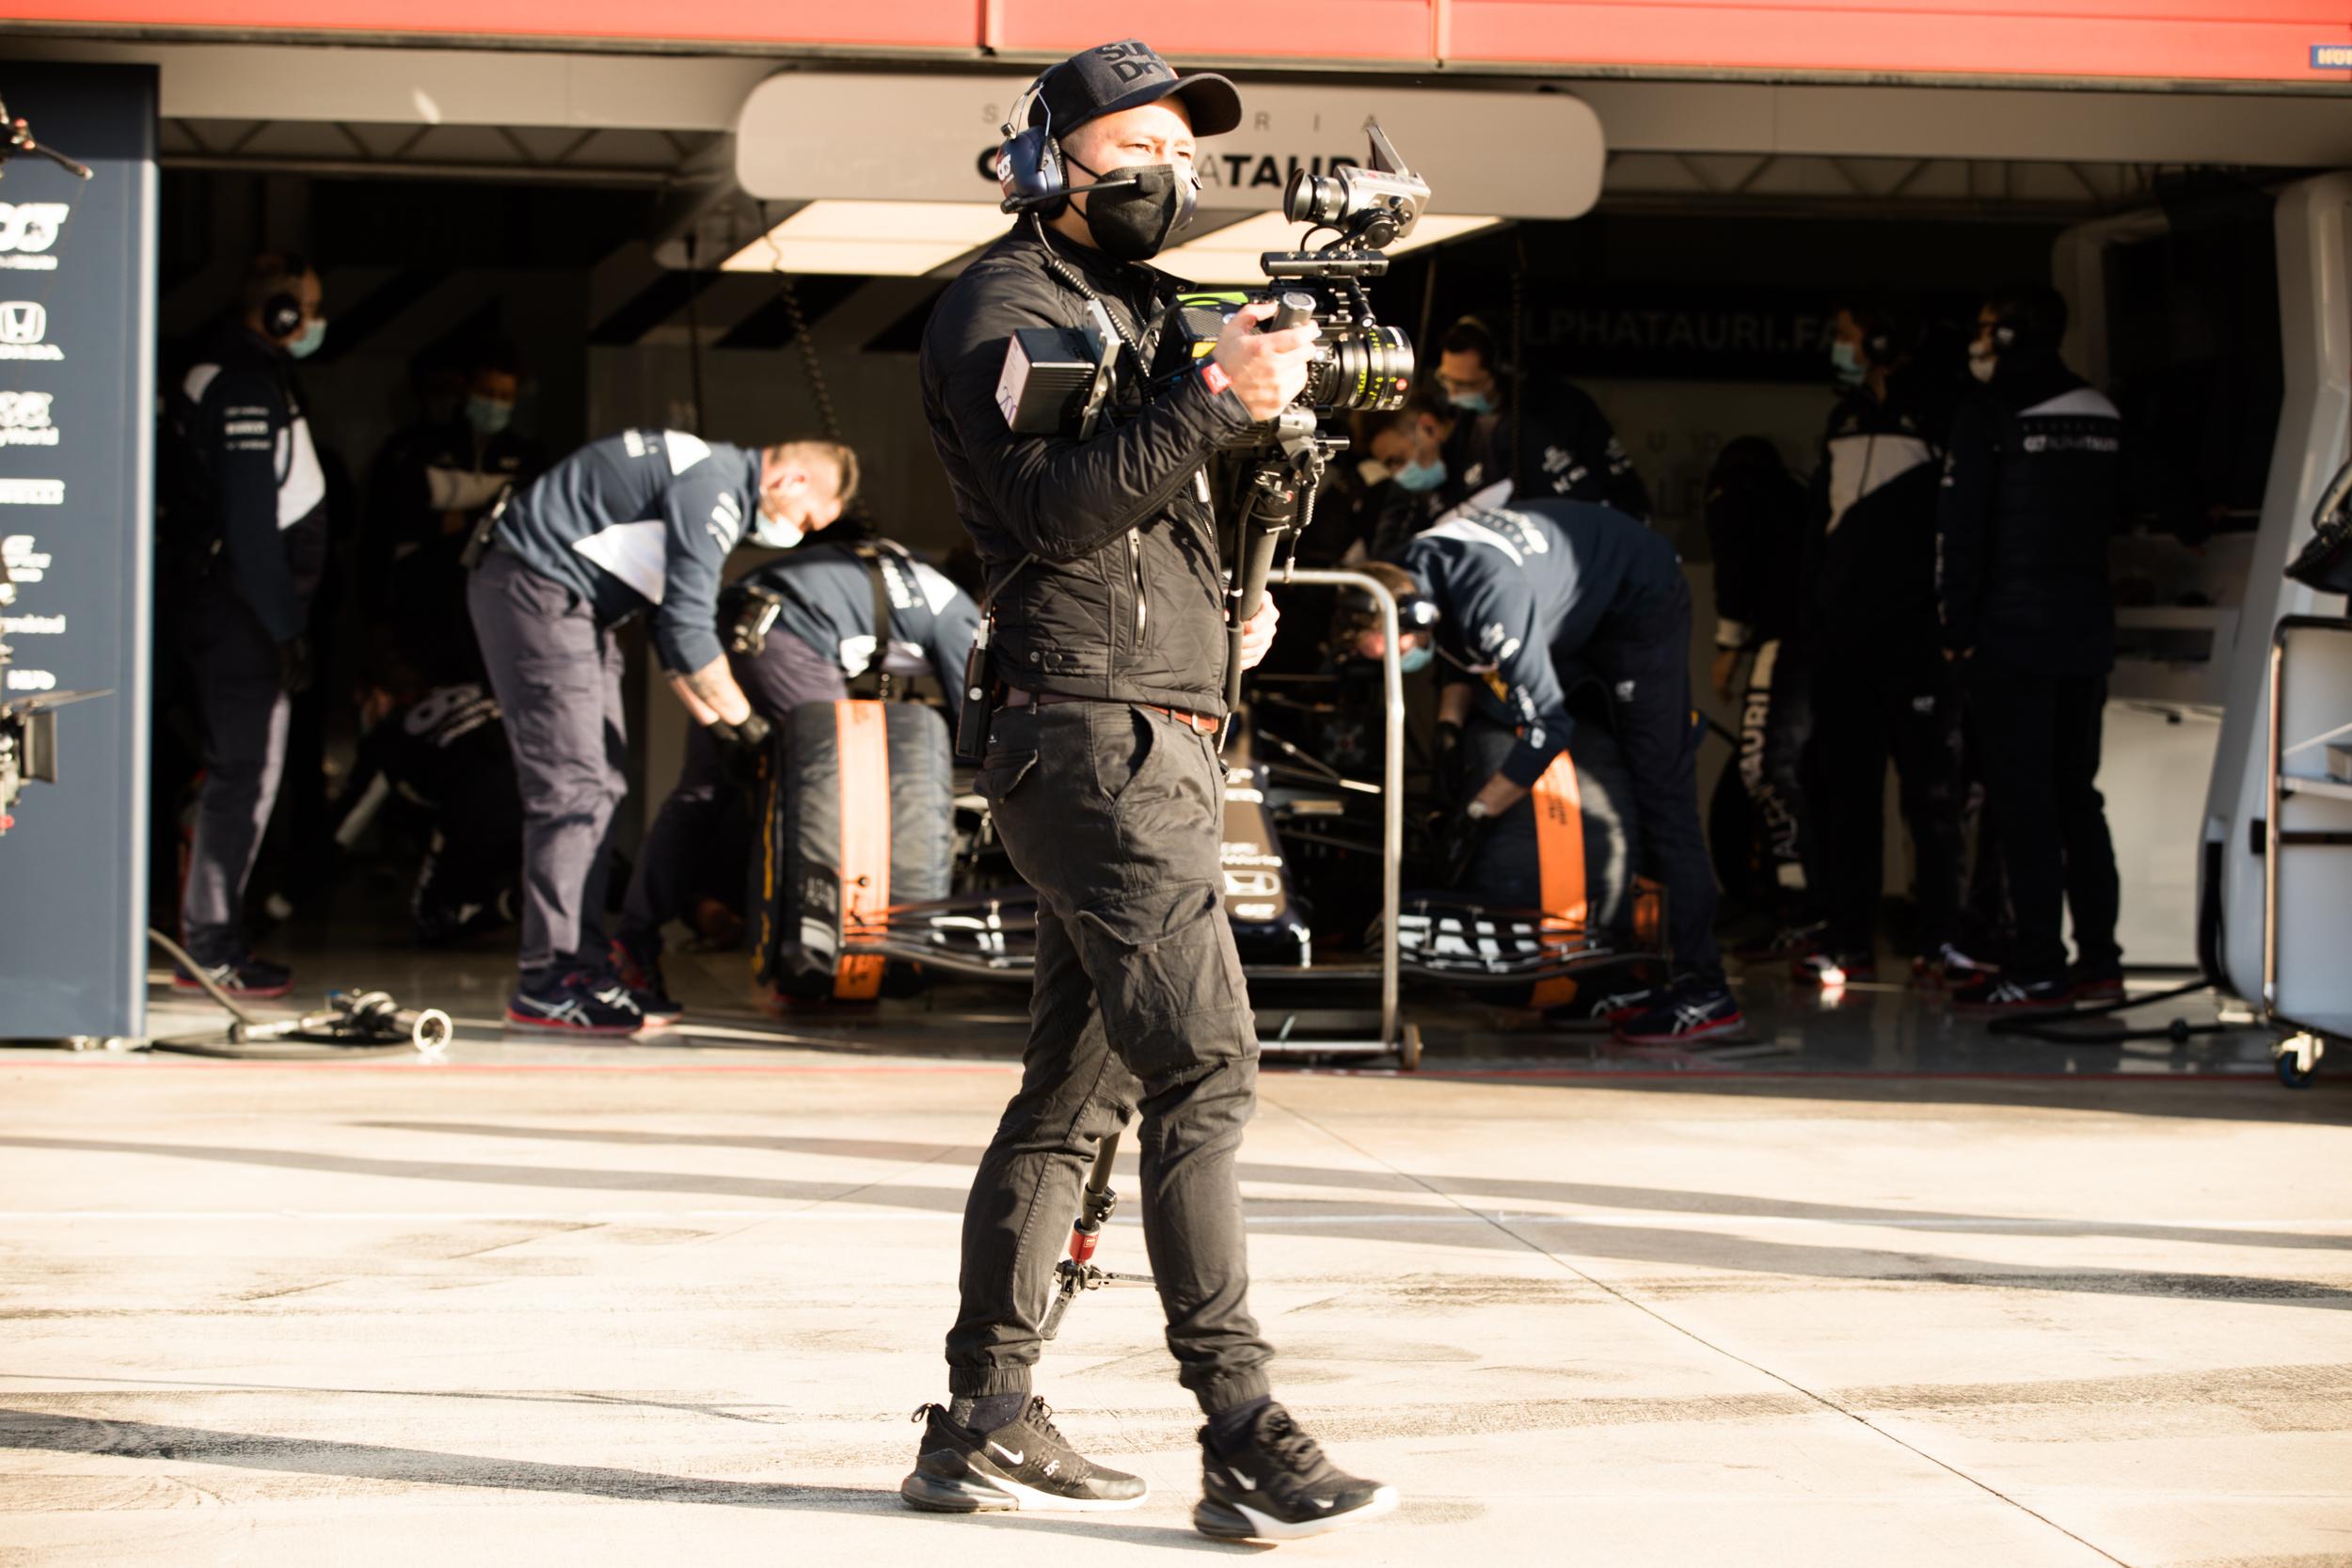 Phuong Herzer walks the Pit-Lane with his Arri Alexa Alpha Tauri F1 Shakedown 2021